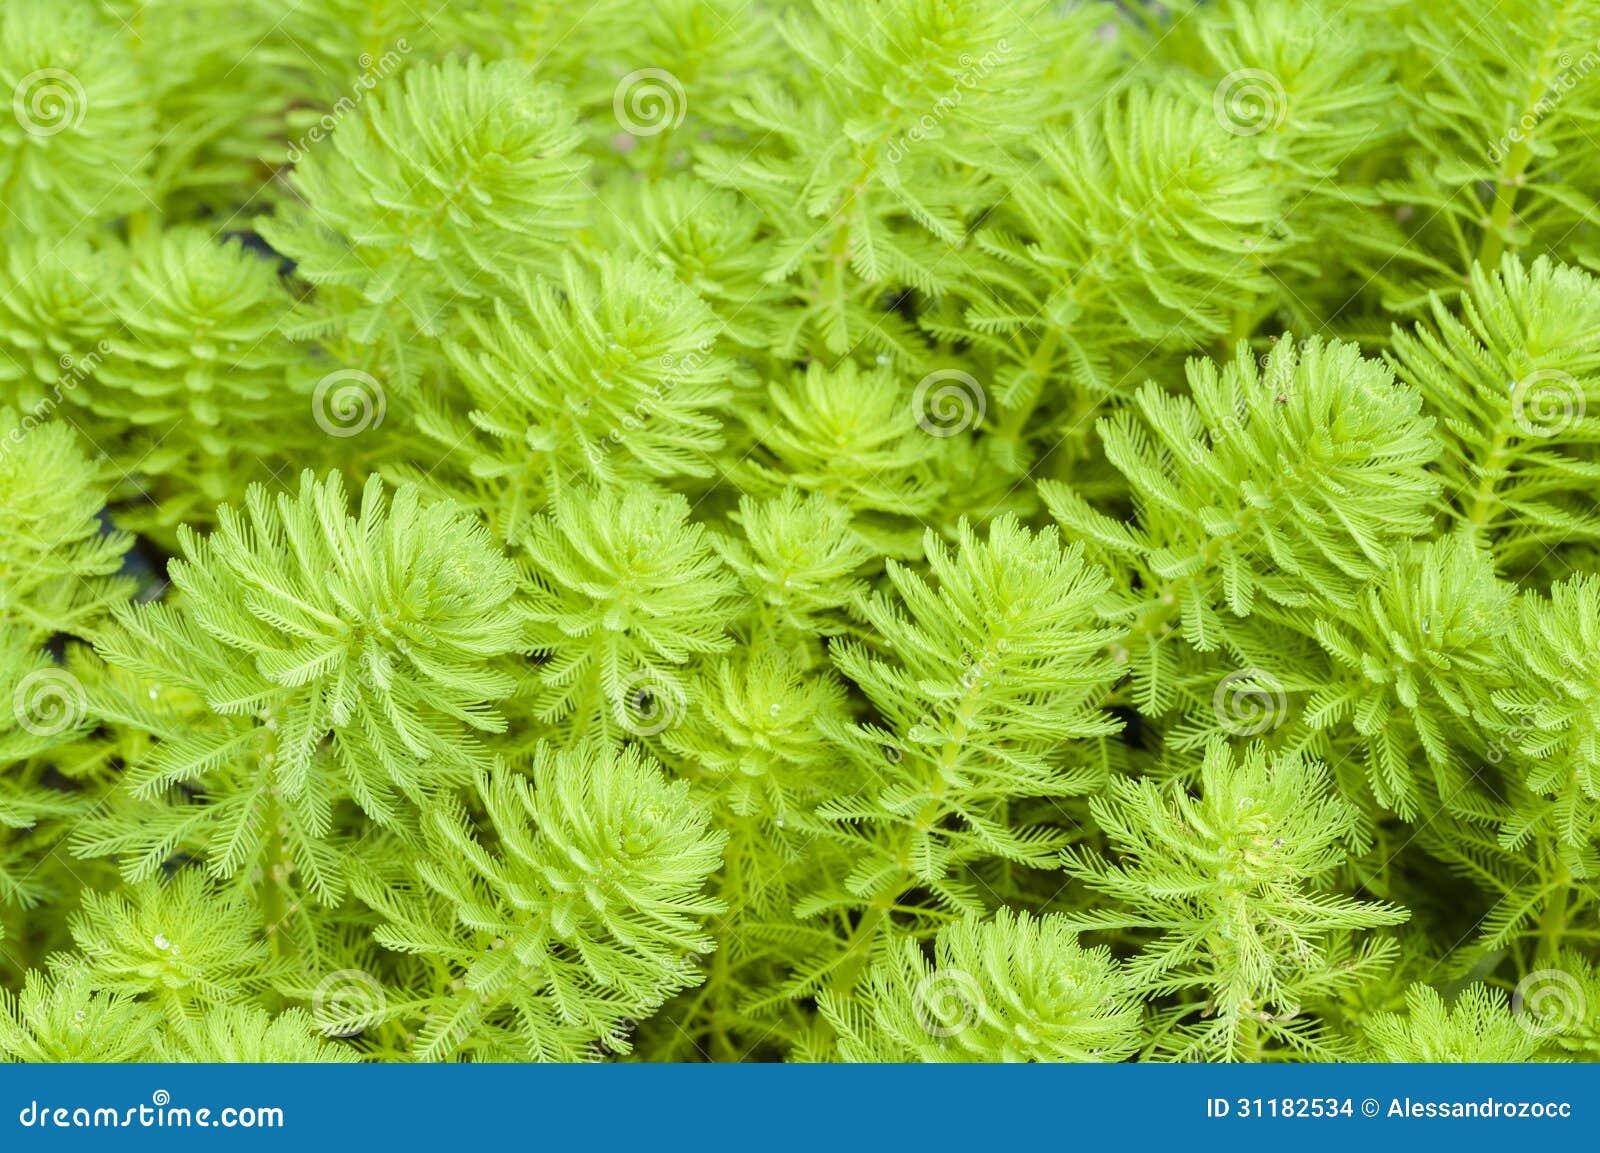 myriophyllum watermilfoil stock images image 31182534